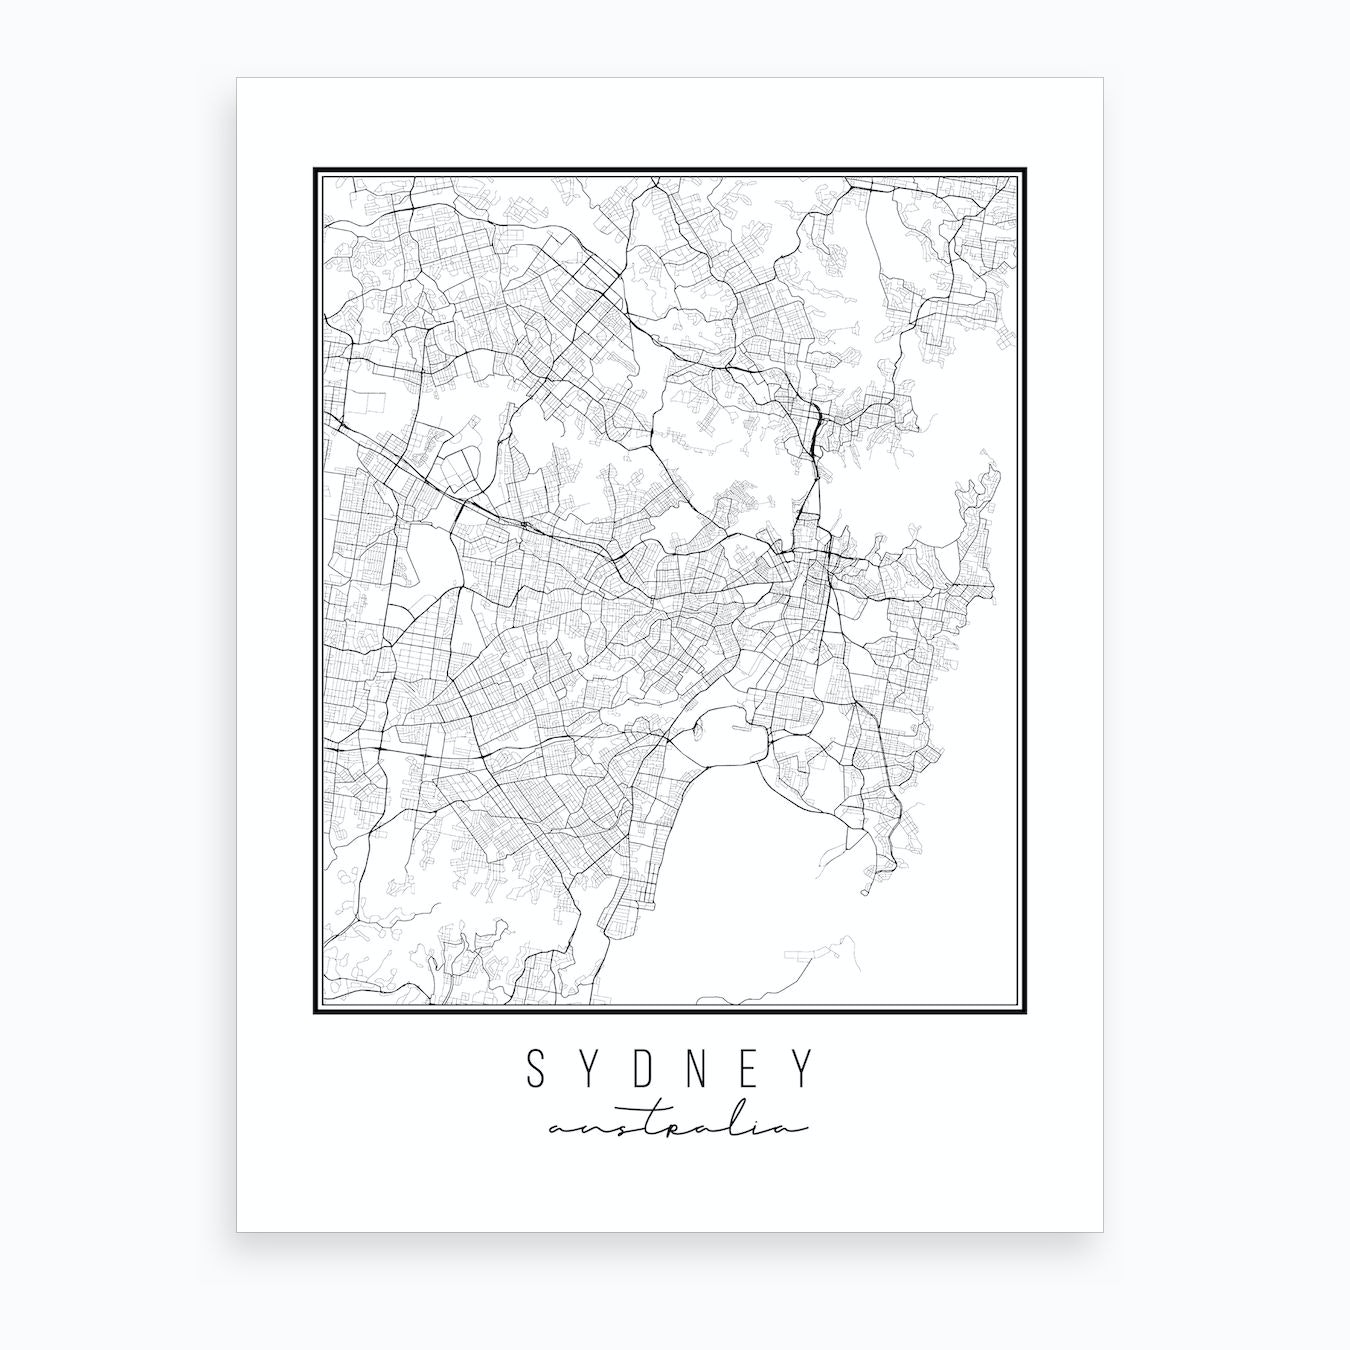 Sydney On Australia Map.Sydney Australia Street Map Art Print